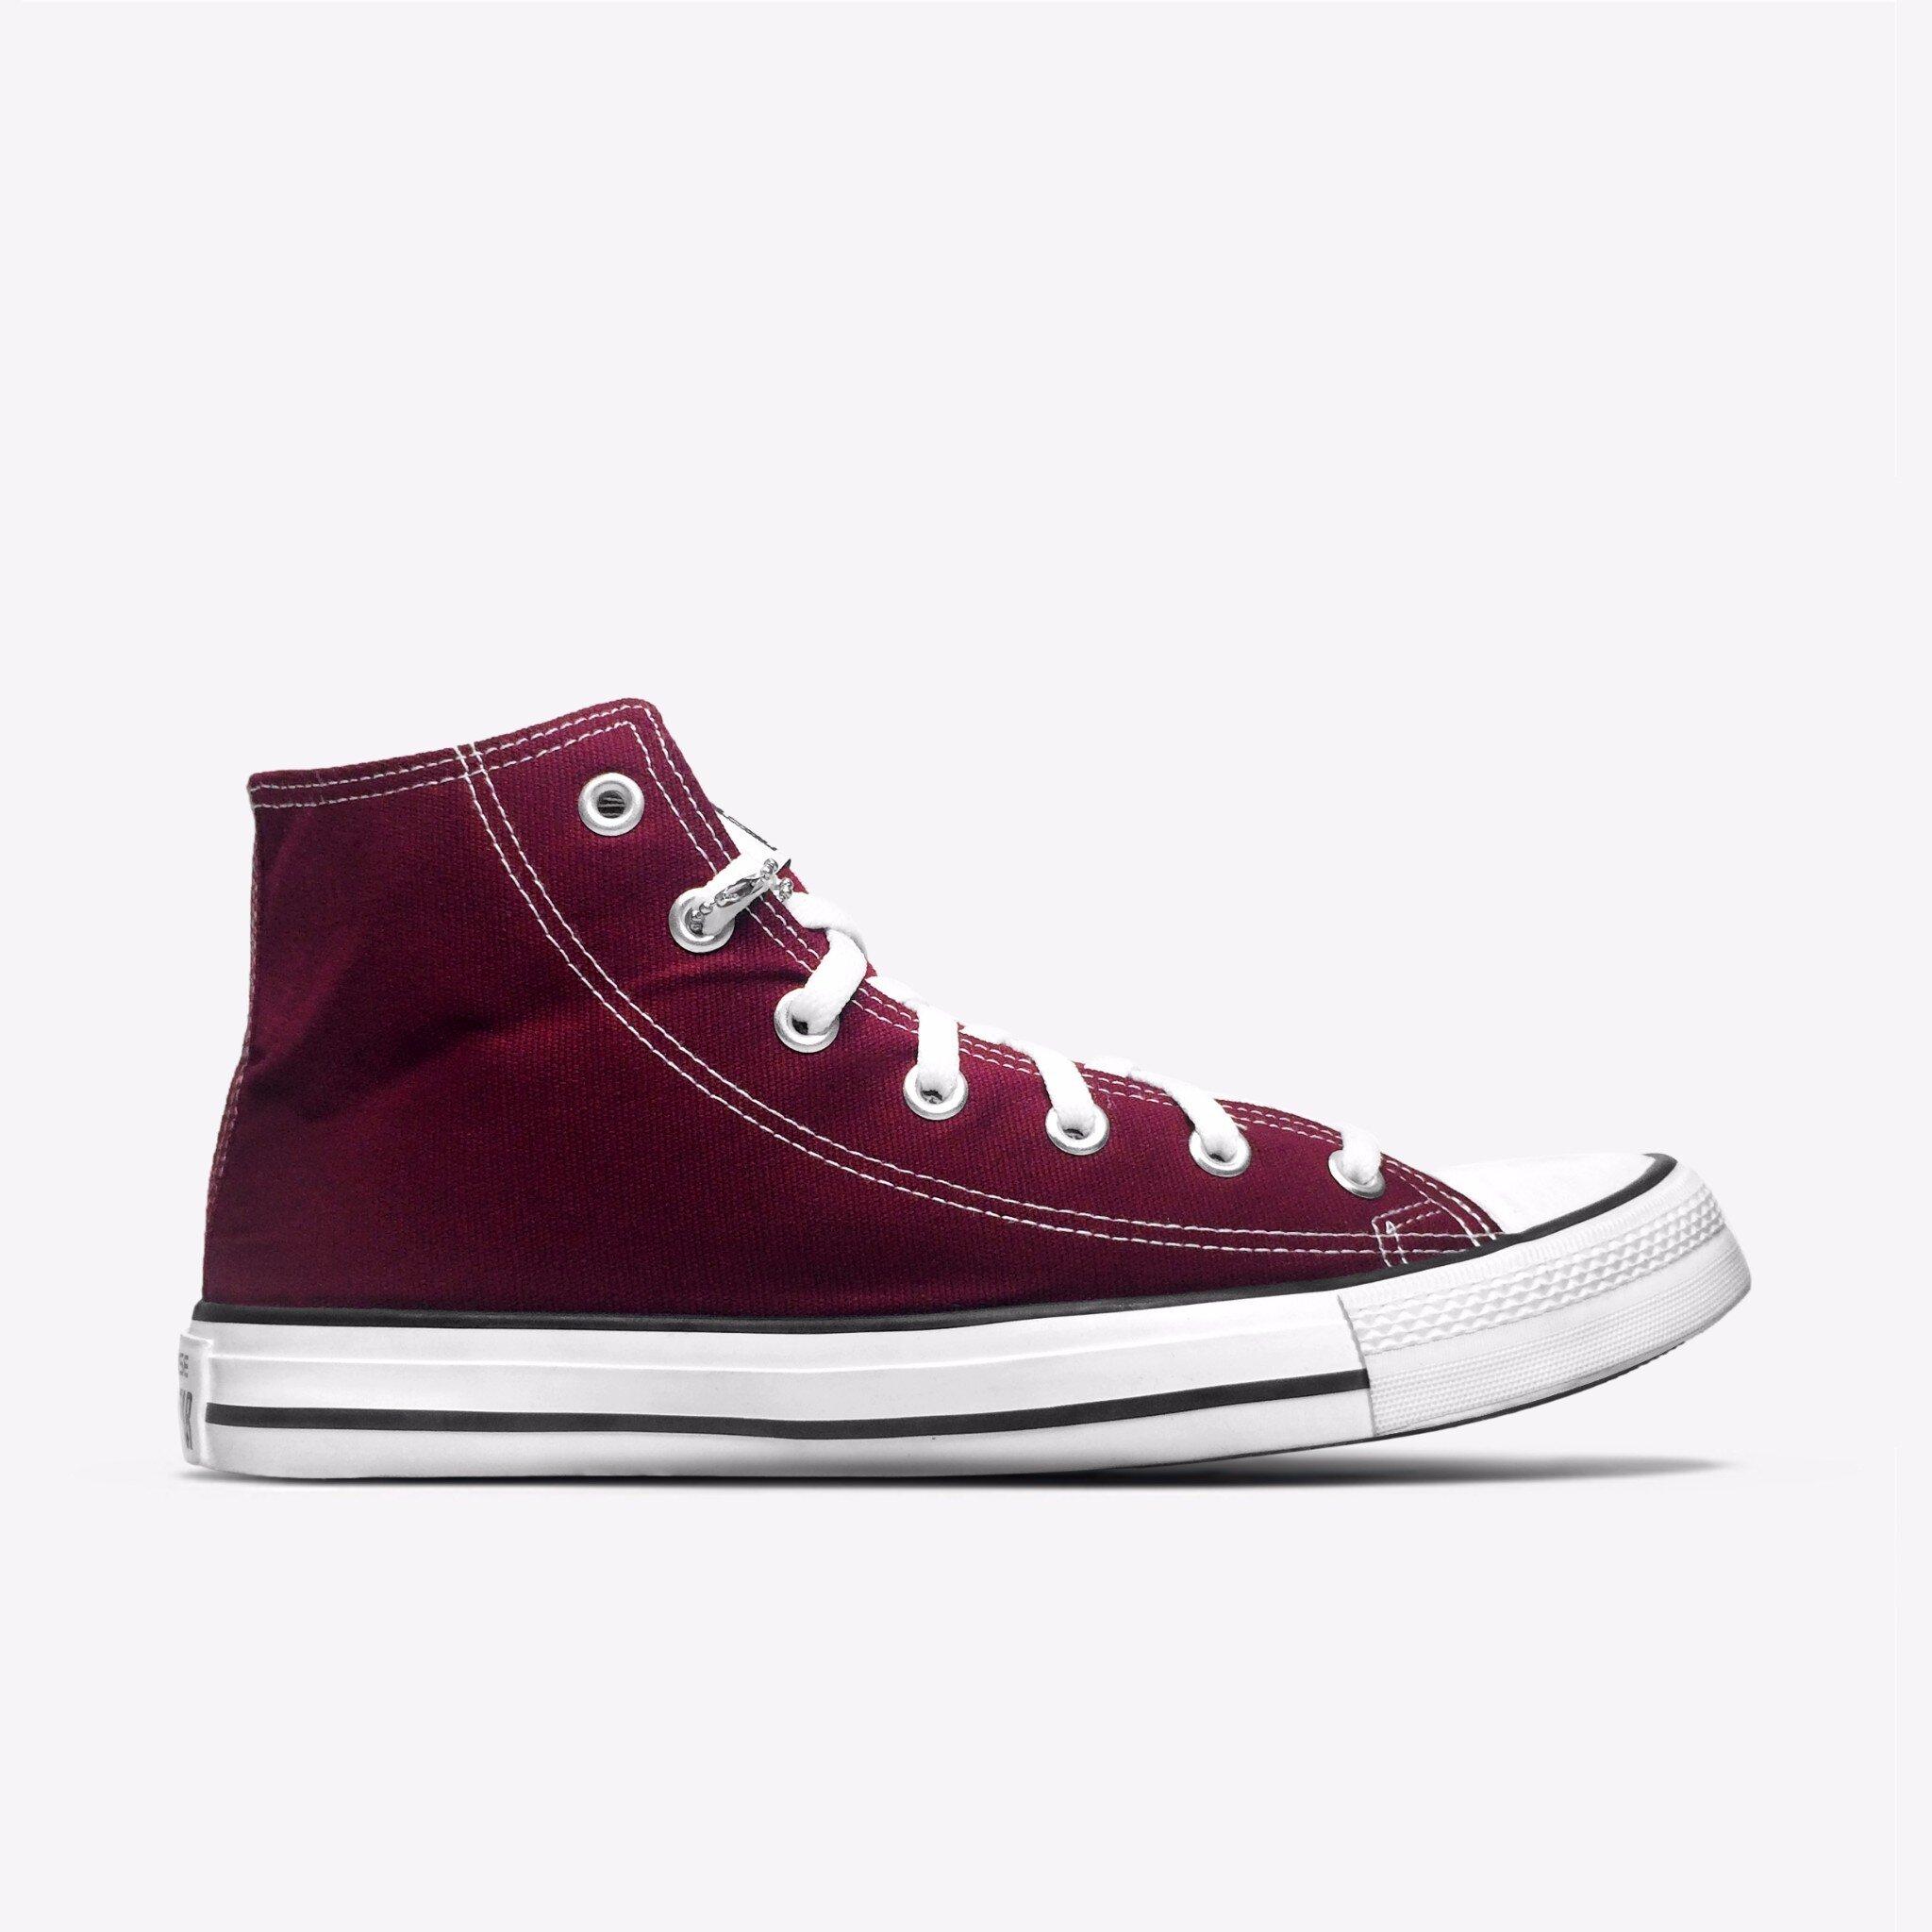 Giày Converse Classic Cổ Cao